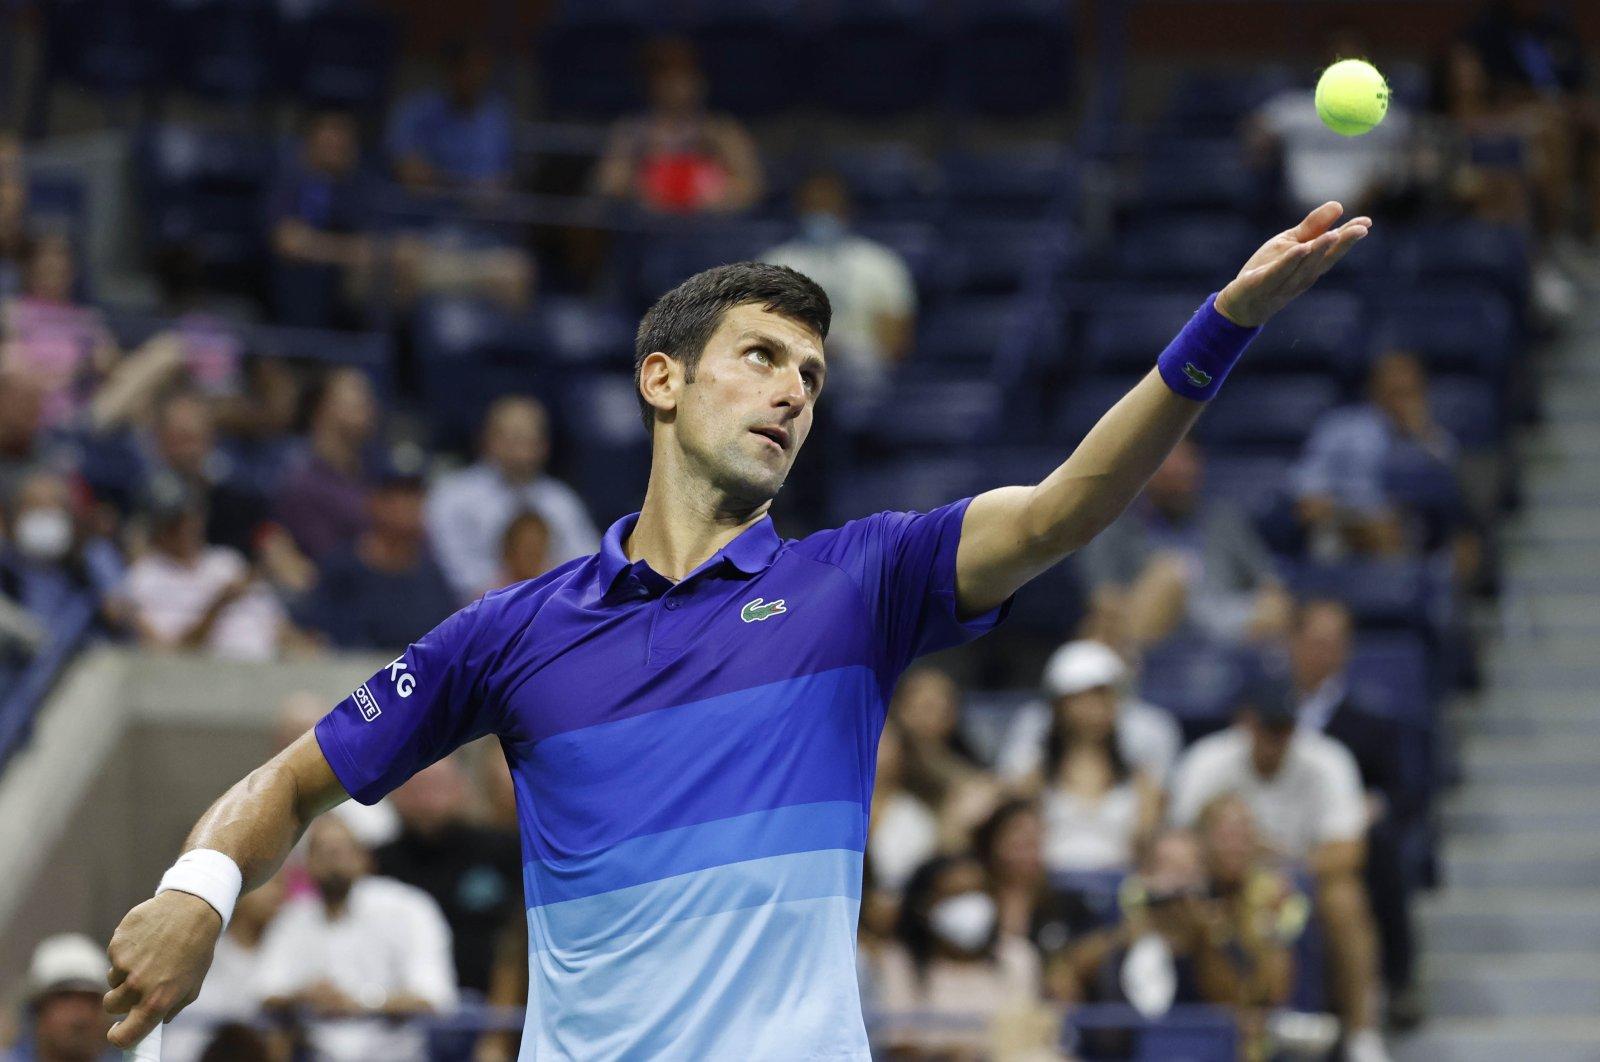 Serbia's Novak Djokovic serves against Denmark's Holger Vitus Nodskov Rune in their U.S. Open first-round match, New York, U.S., Aug. 31, 2021. (Reuters Photo)